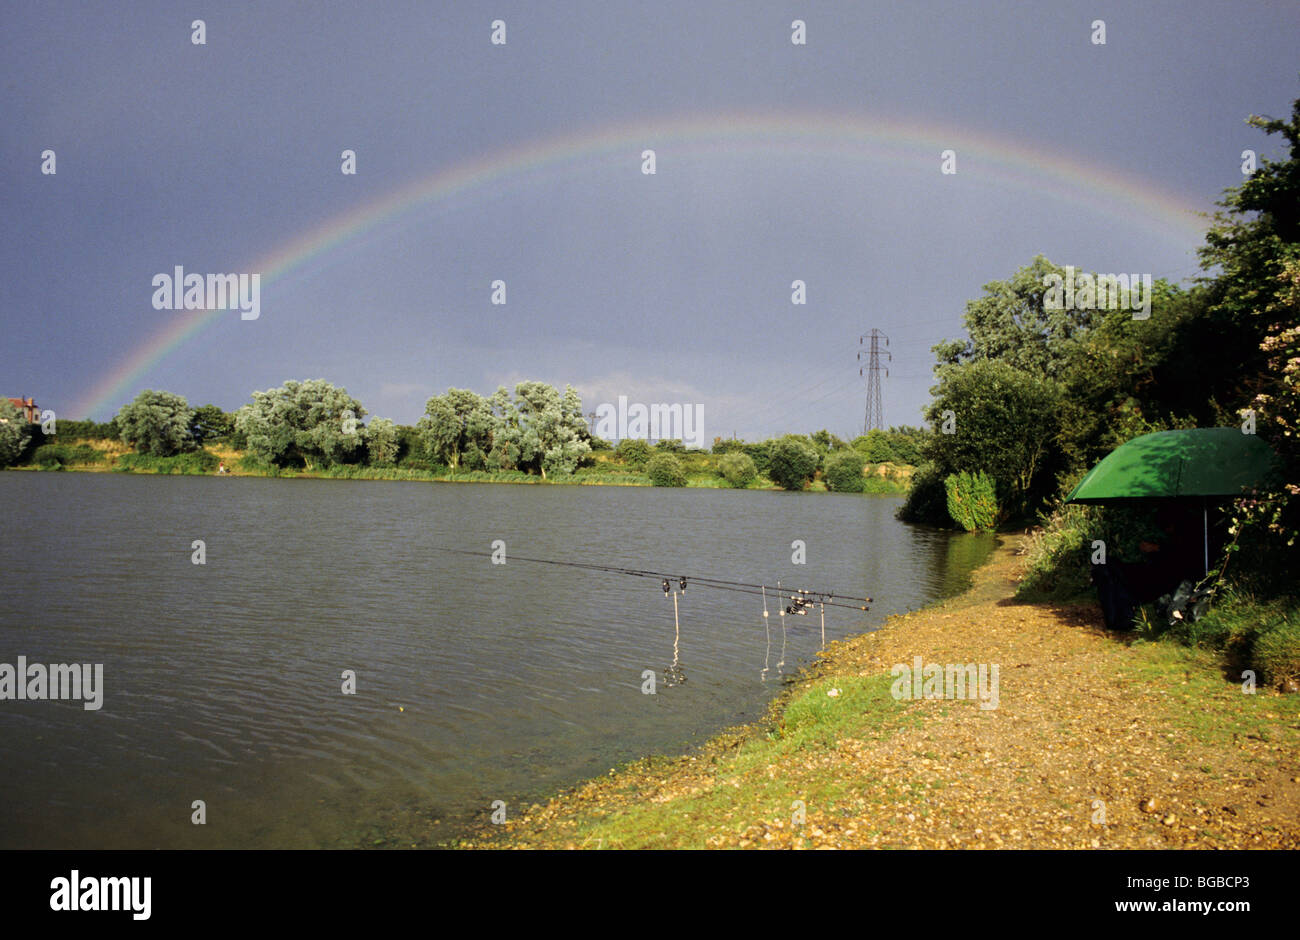 Rainbow over a lake - Stock Image